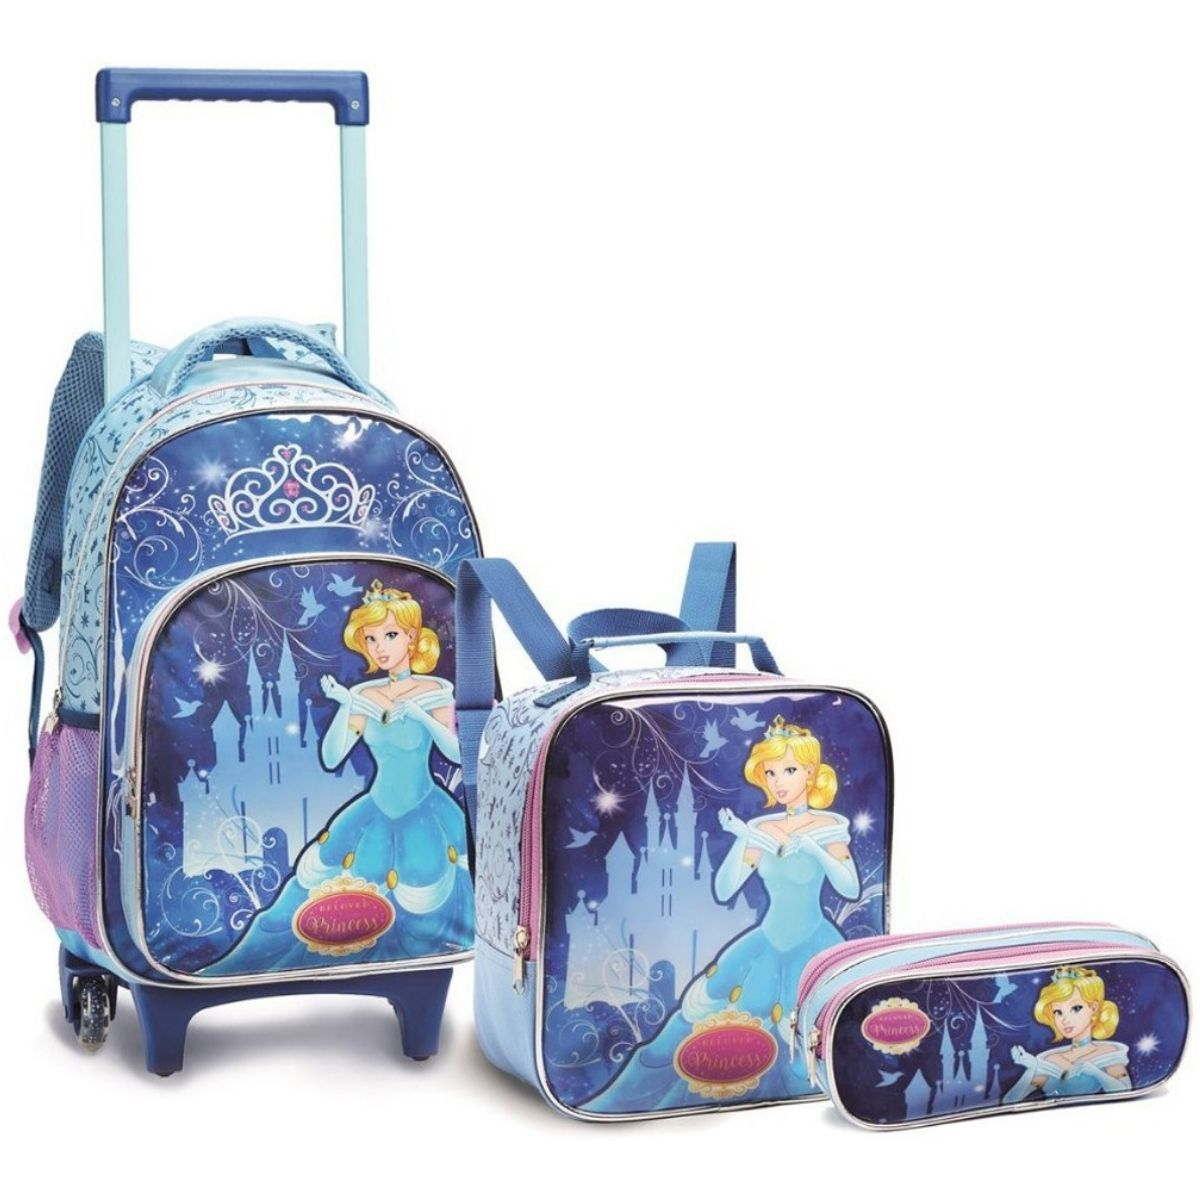 Kit Mochila Infantil Escolar Feminina Princesas De Rodinha Seanite - KT13951